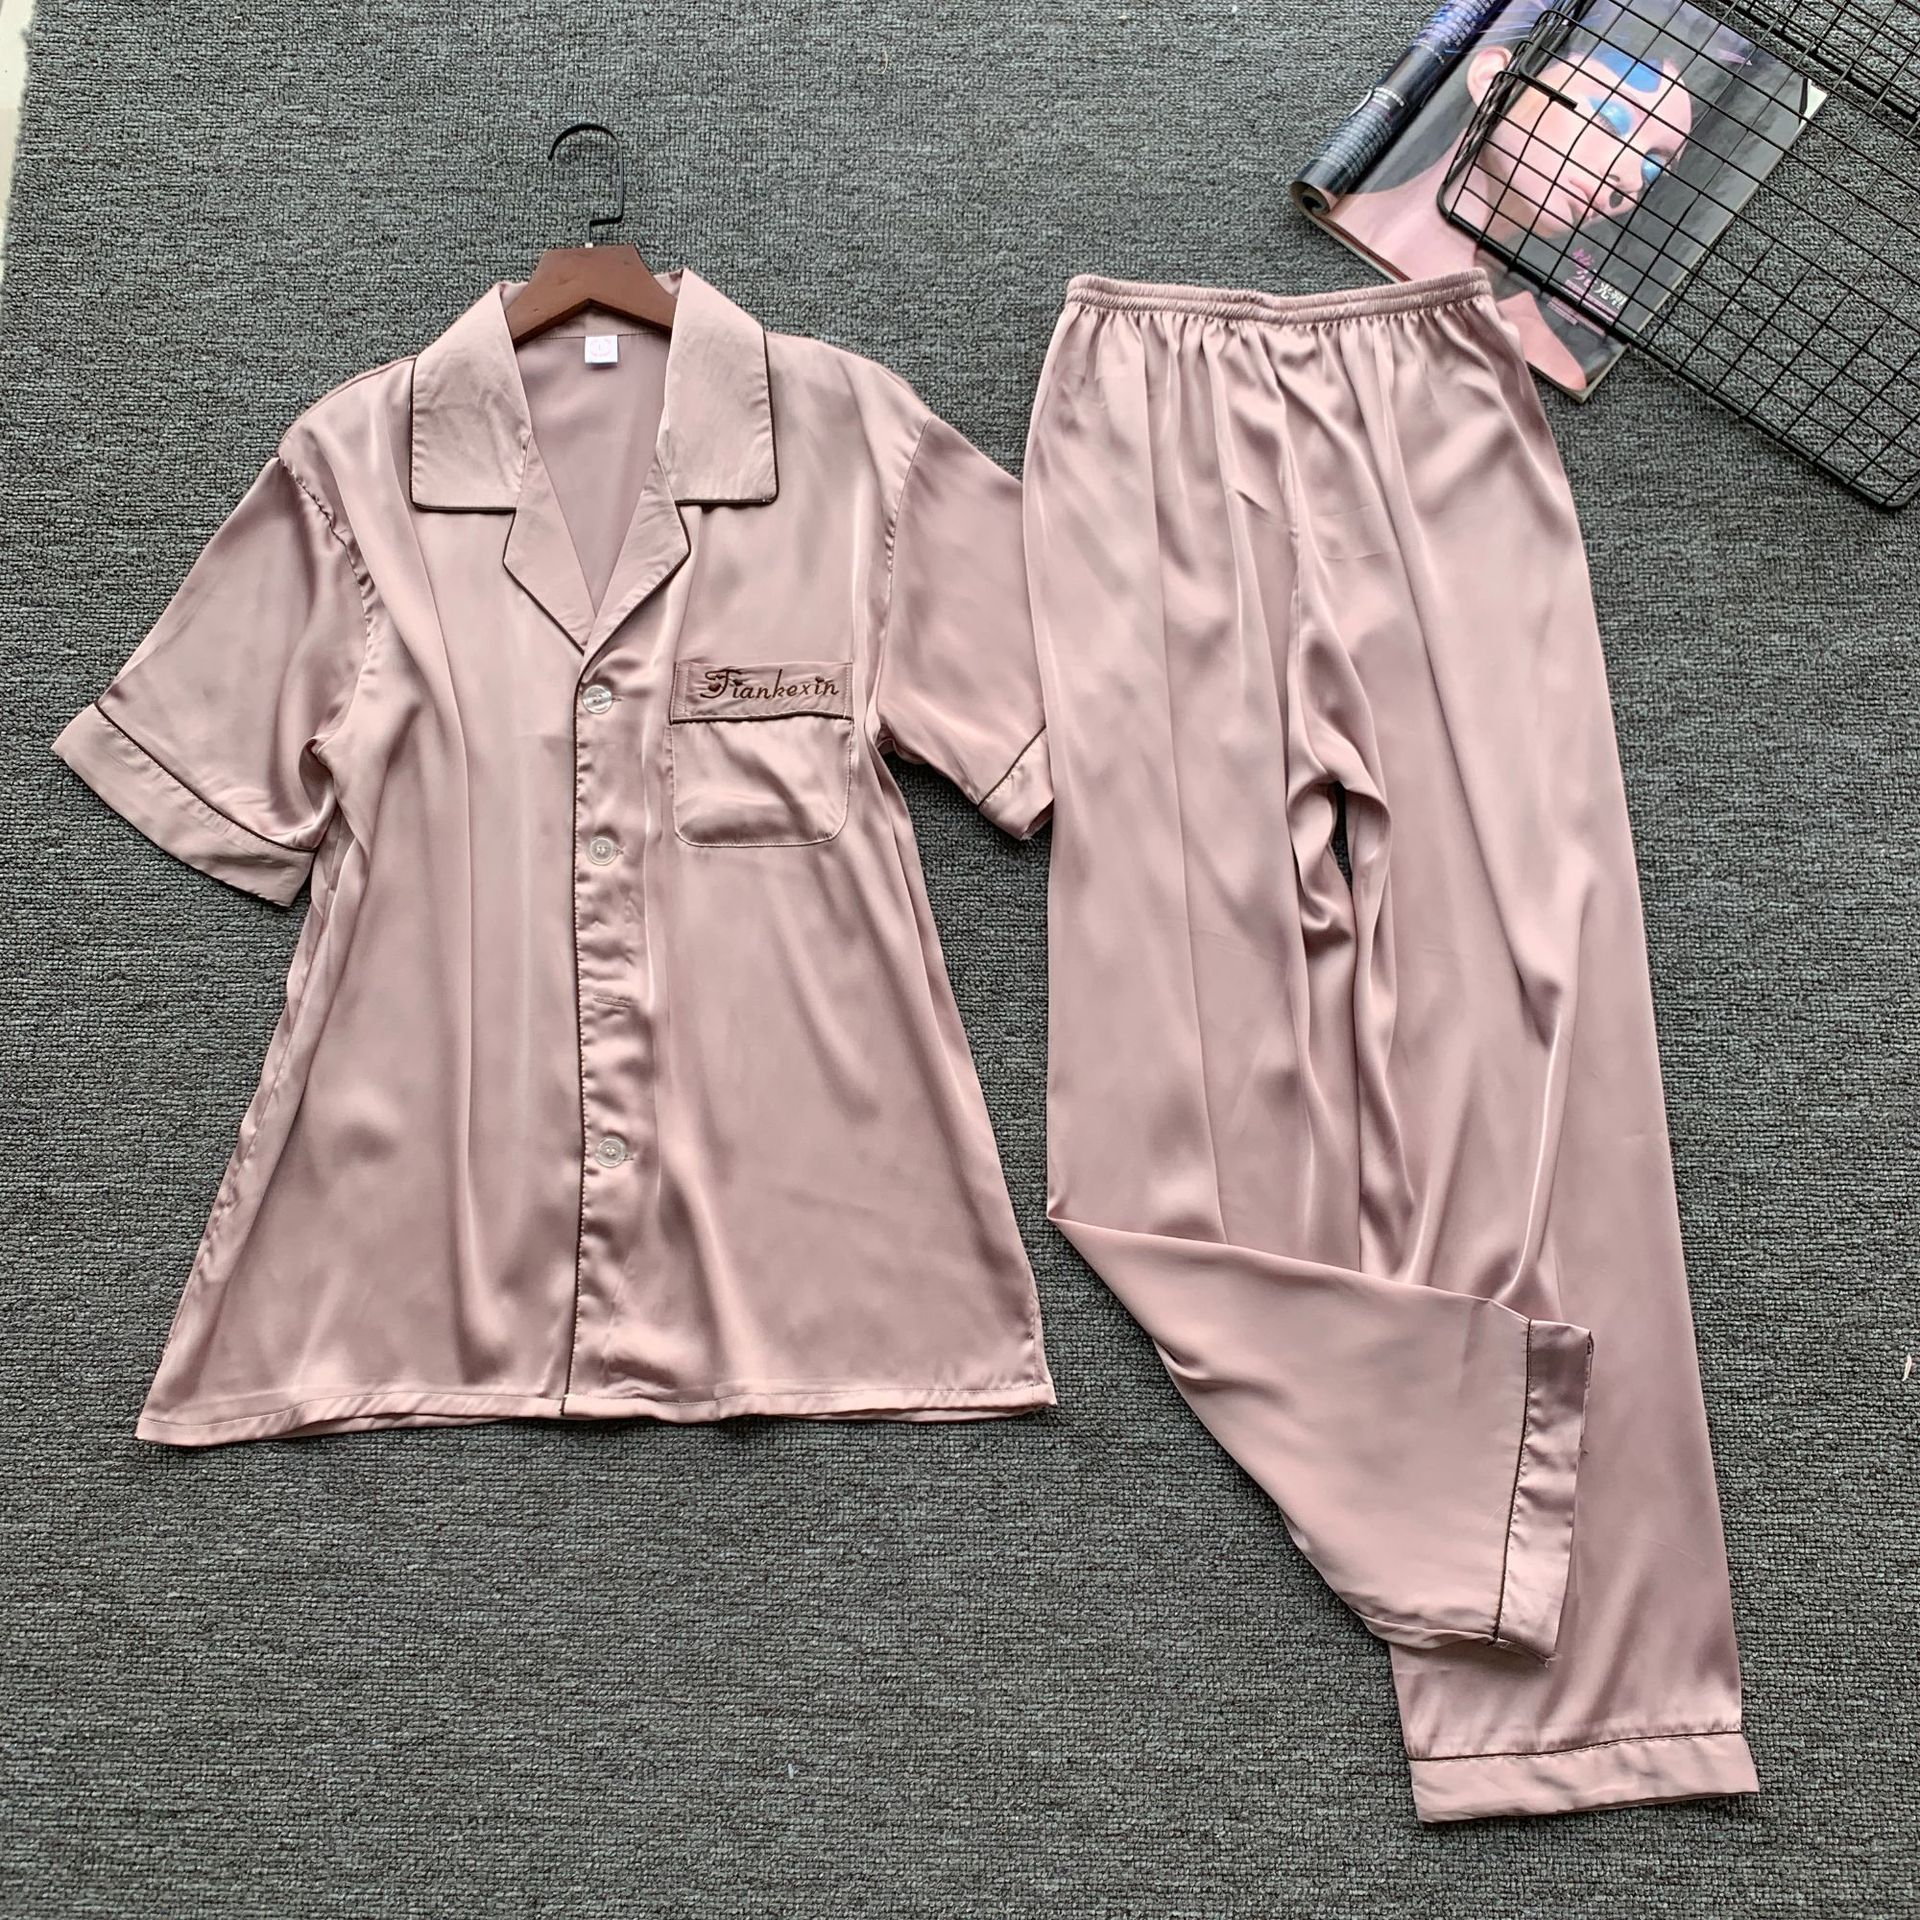 Pink Men 2pcs Sleepwear Satin Short Sleeve Top&pants Sleepwear Print Kimono Gown Casual Home Clothing Summer New Pajamas Suit